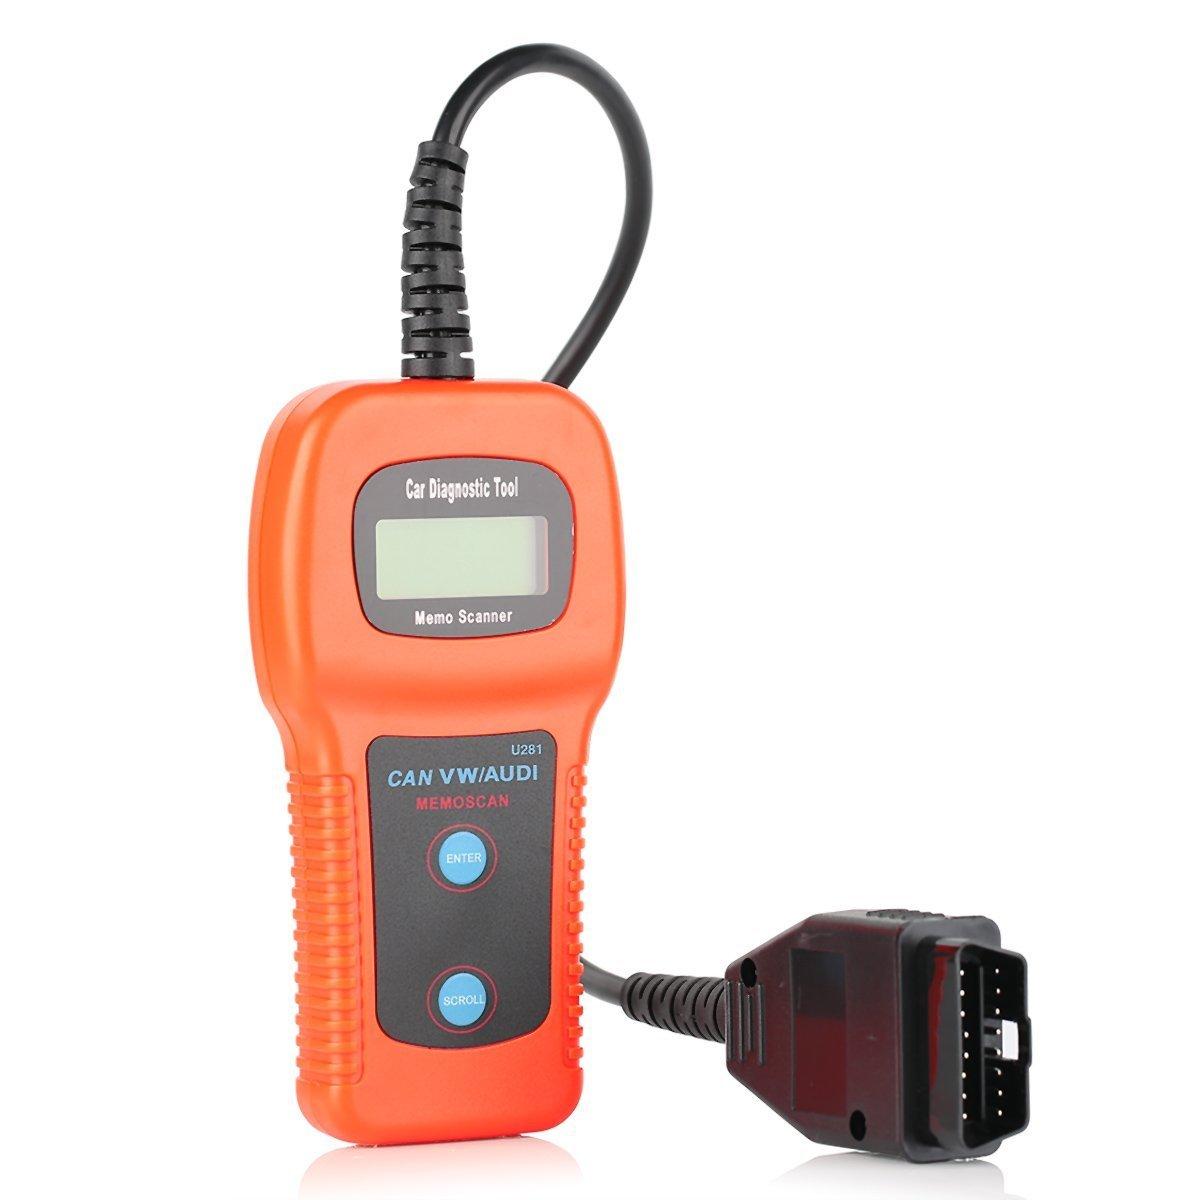 Xtool U281 CAN BUS OBD2 Code Reader Auto Diagnostics Scan Tool for Vw Audi Seat Skoda Vehicles - Orange